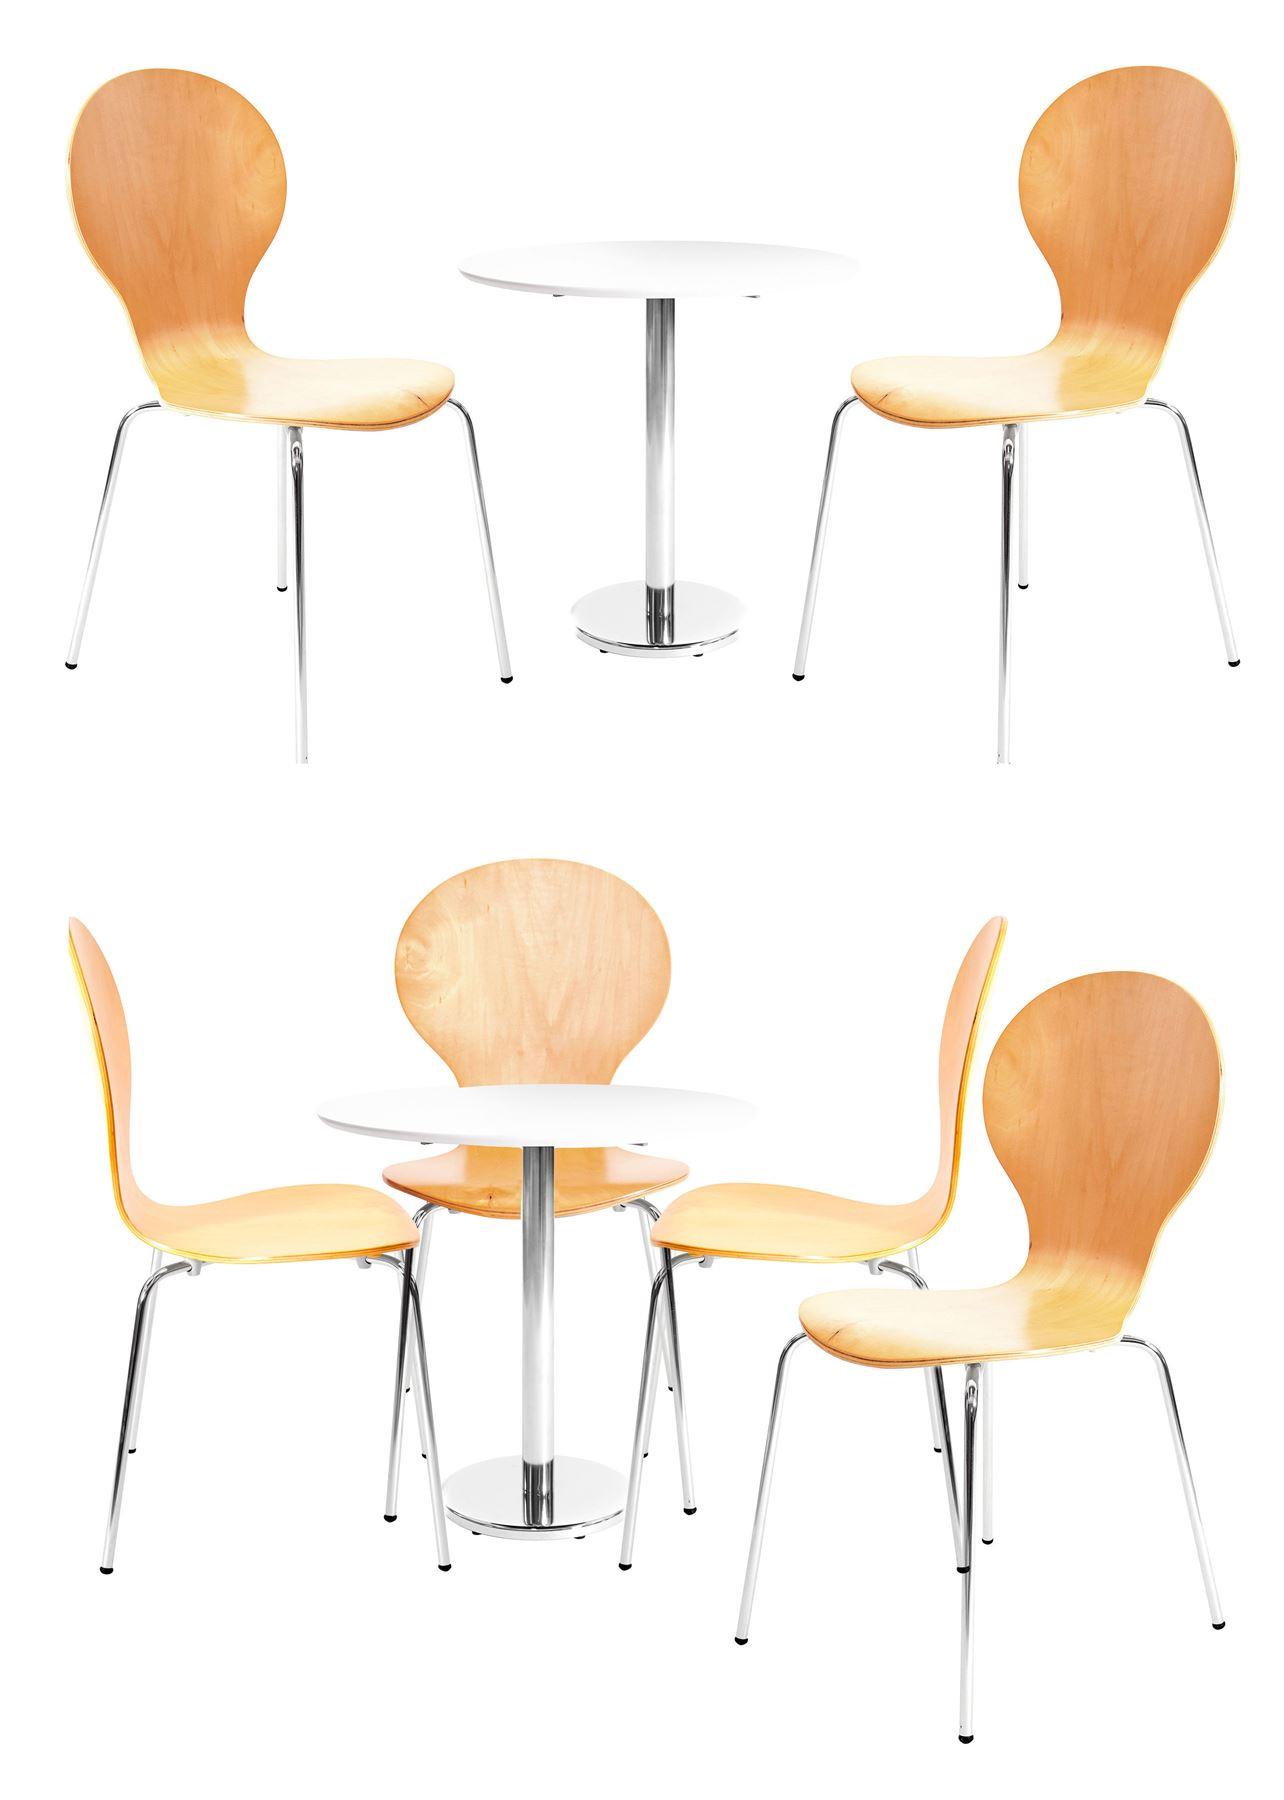 ALDERNEY DINING TABLE amp JERSEY CHAIR SET GUERNSEY ROUND  : 8b72fc97 28b5 4014 943e b68c940752b3 from www.ebay.co.uk size 1284 x 1800 jpeg 103kB